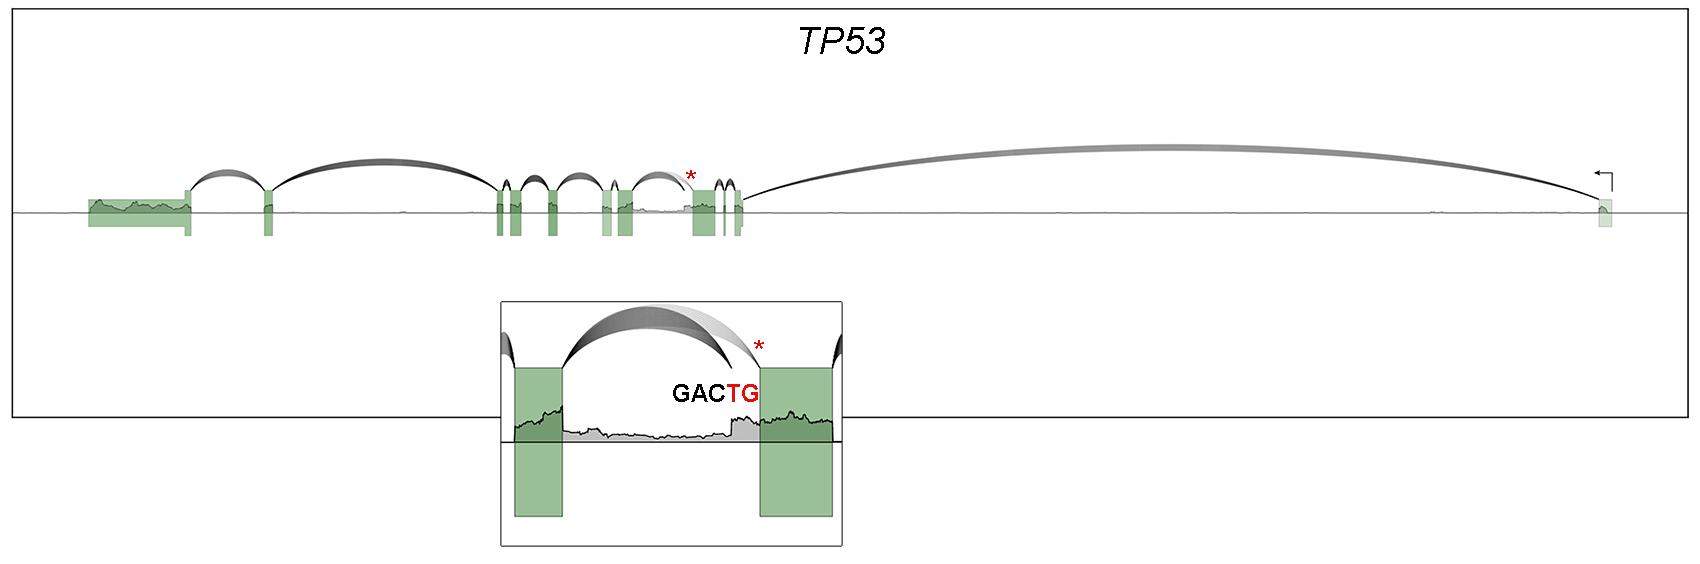 TP53 SpliceV plot